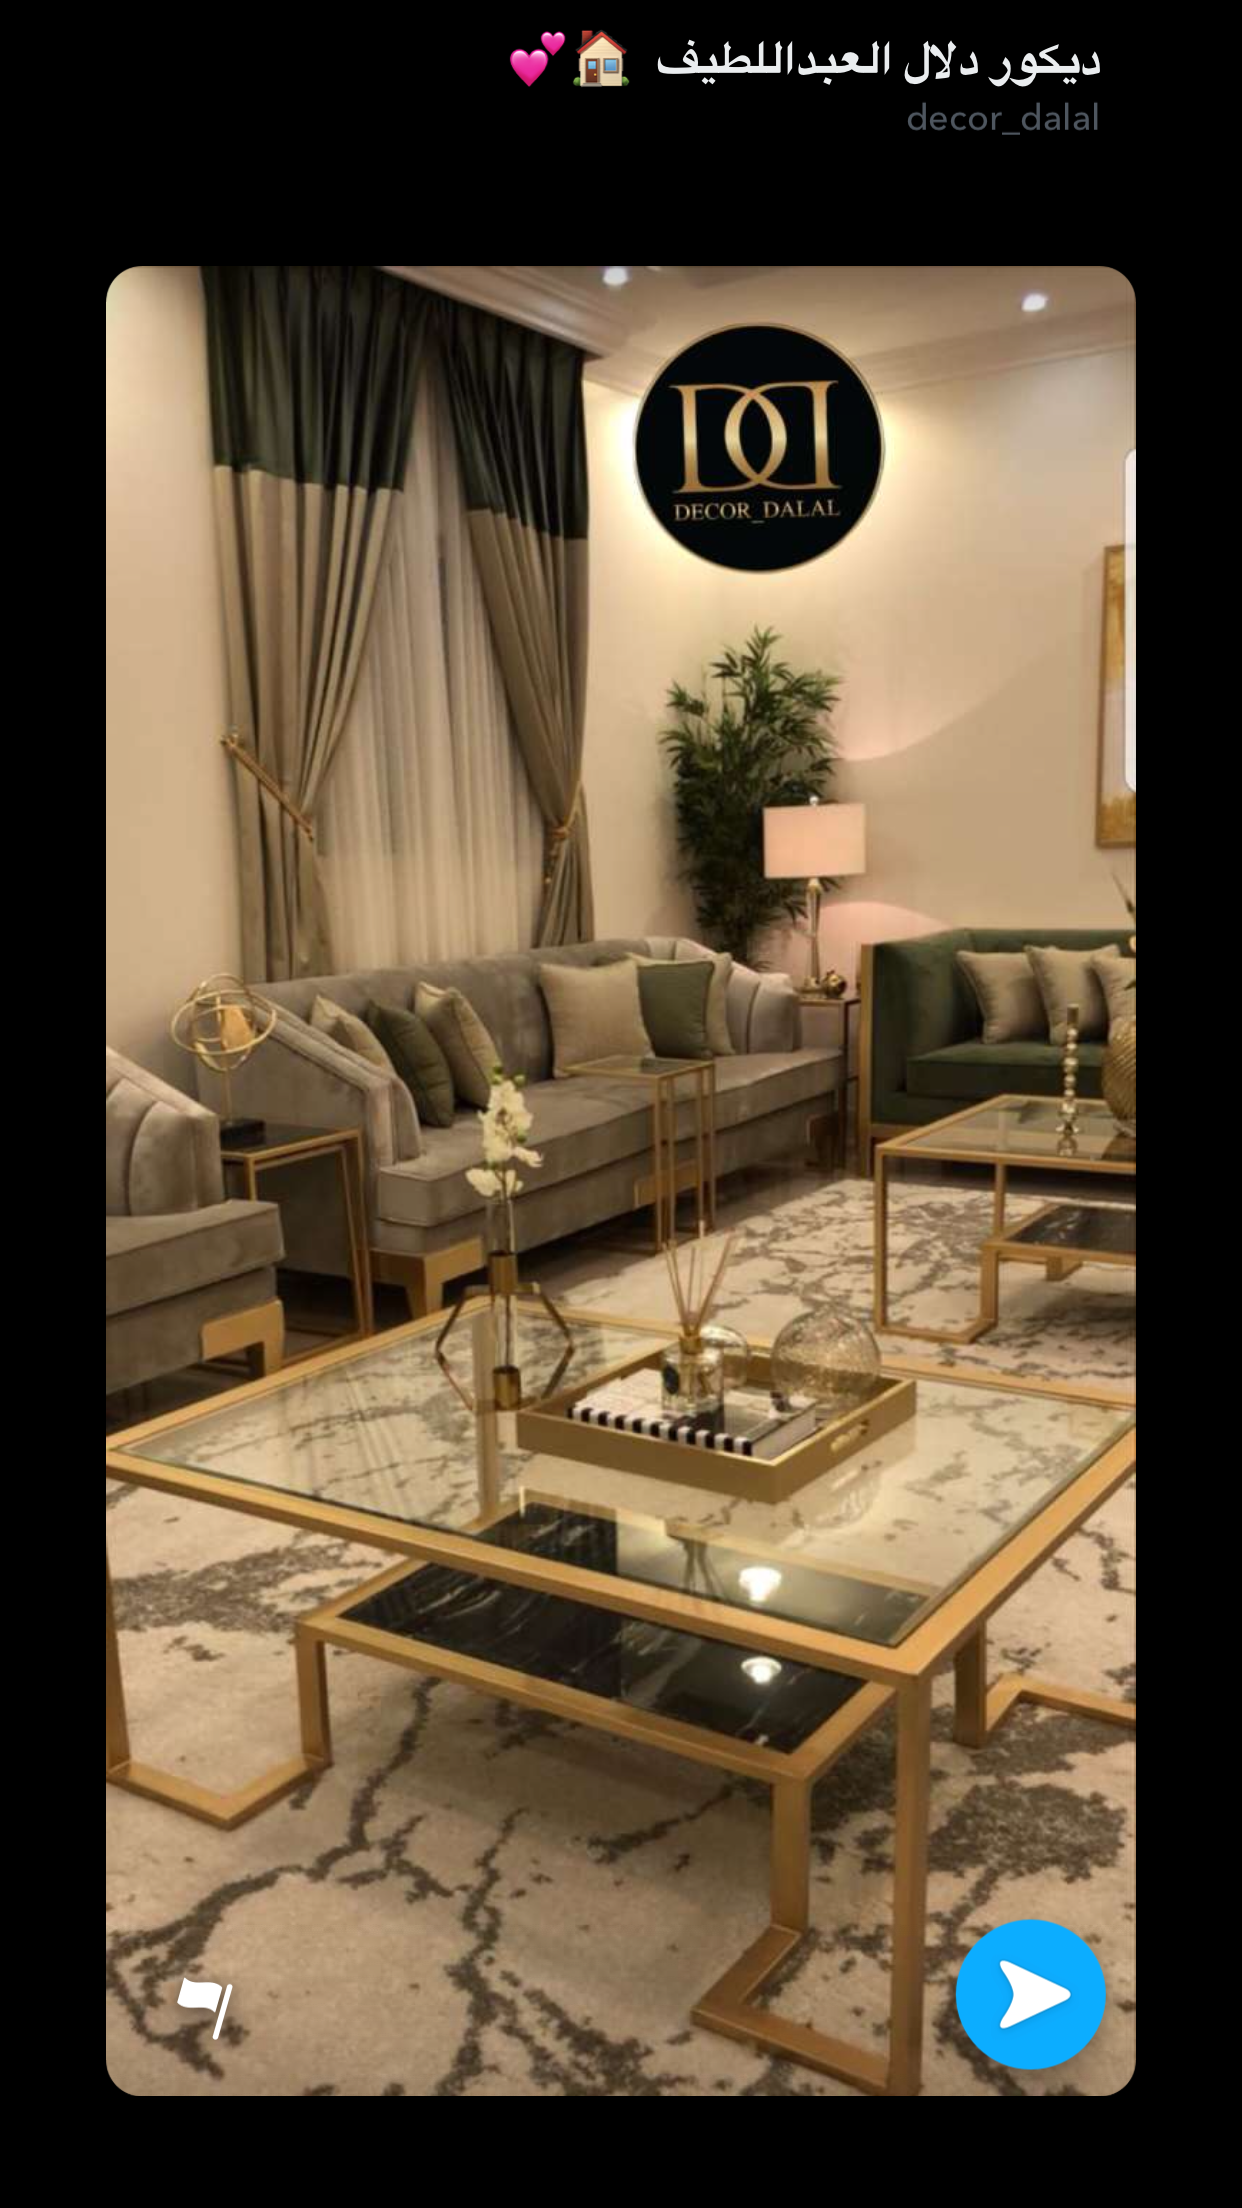 Pin By Razan On ديكور Home Design Living Room Living Room Decor Cozy Living Room Design Decor